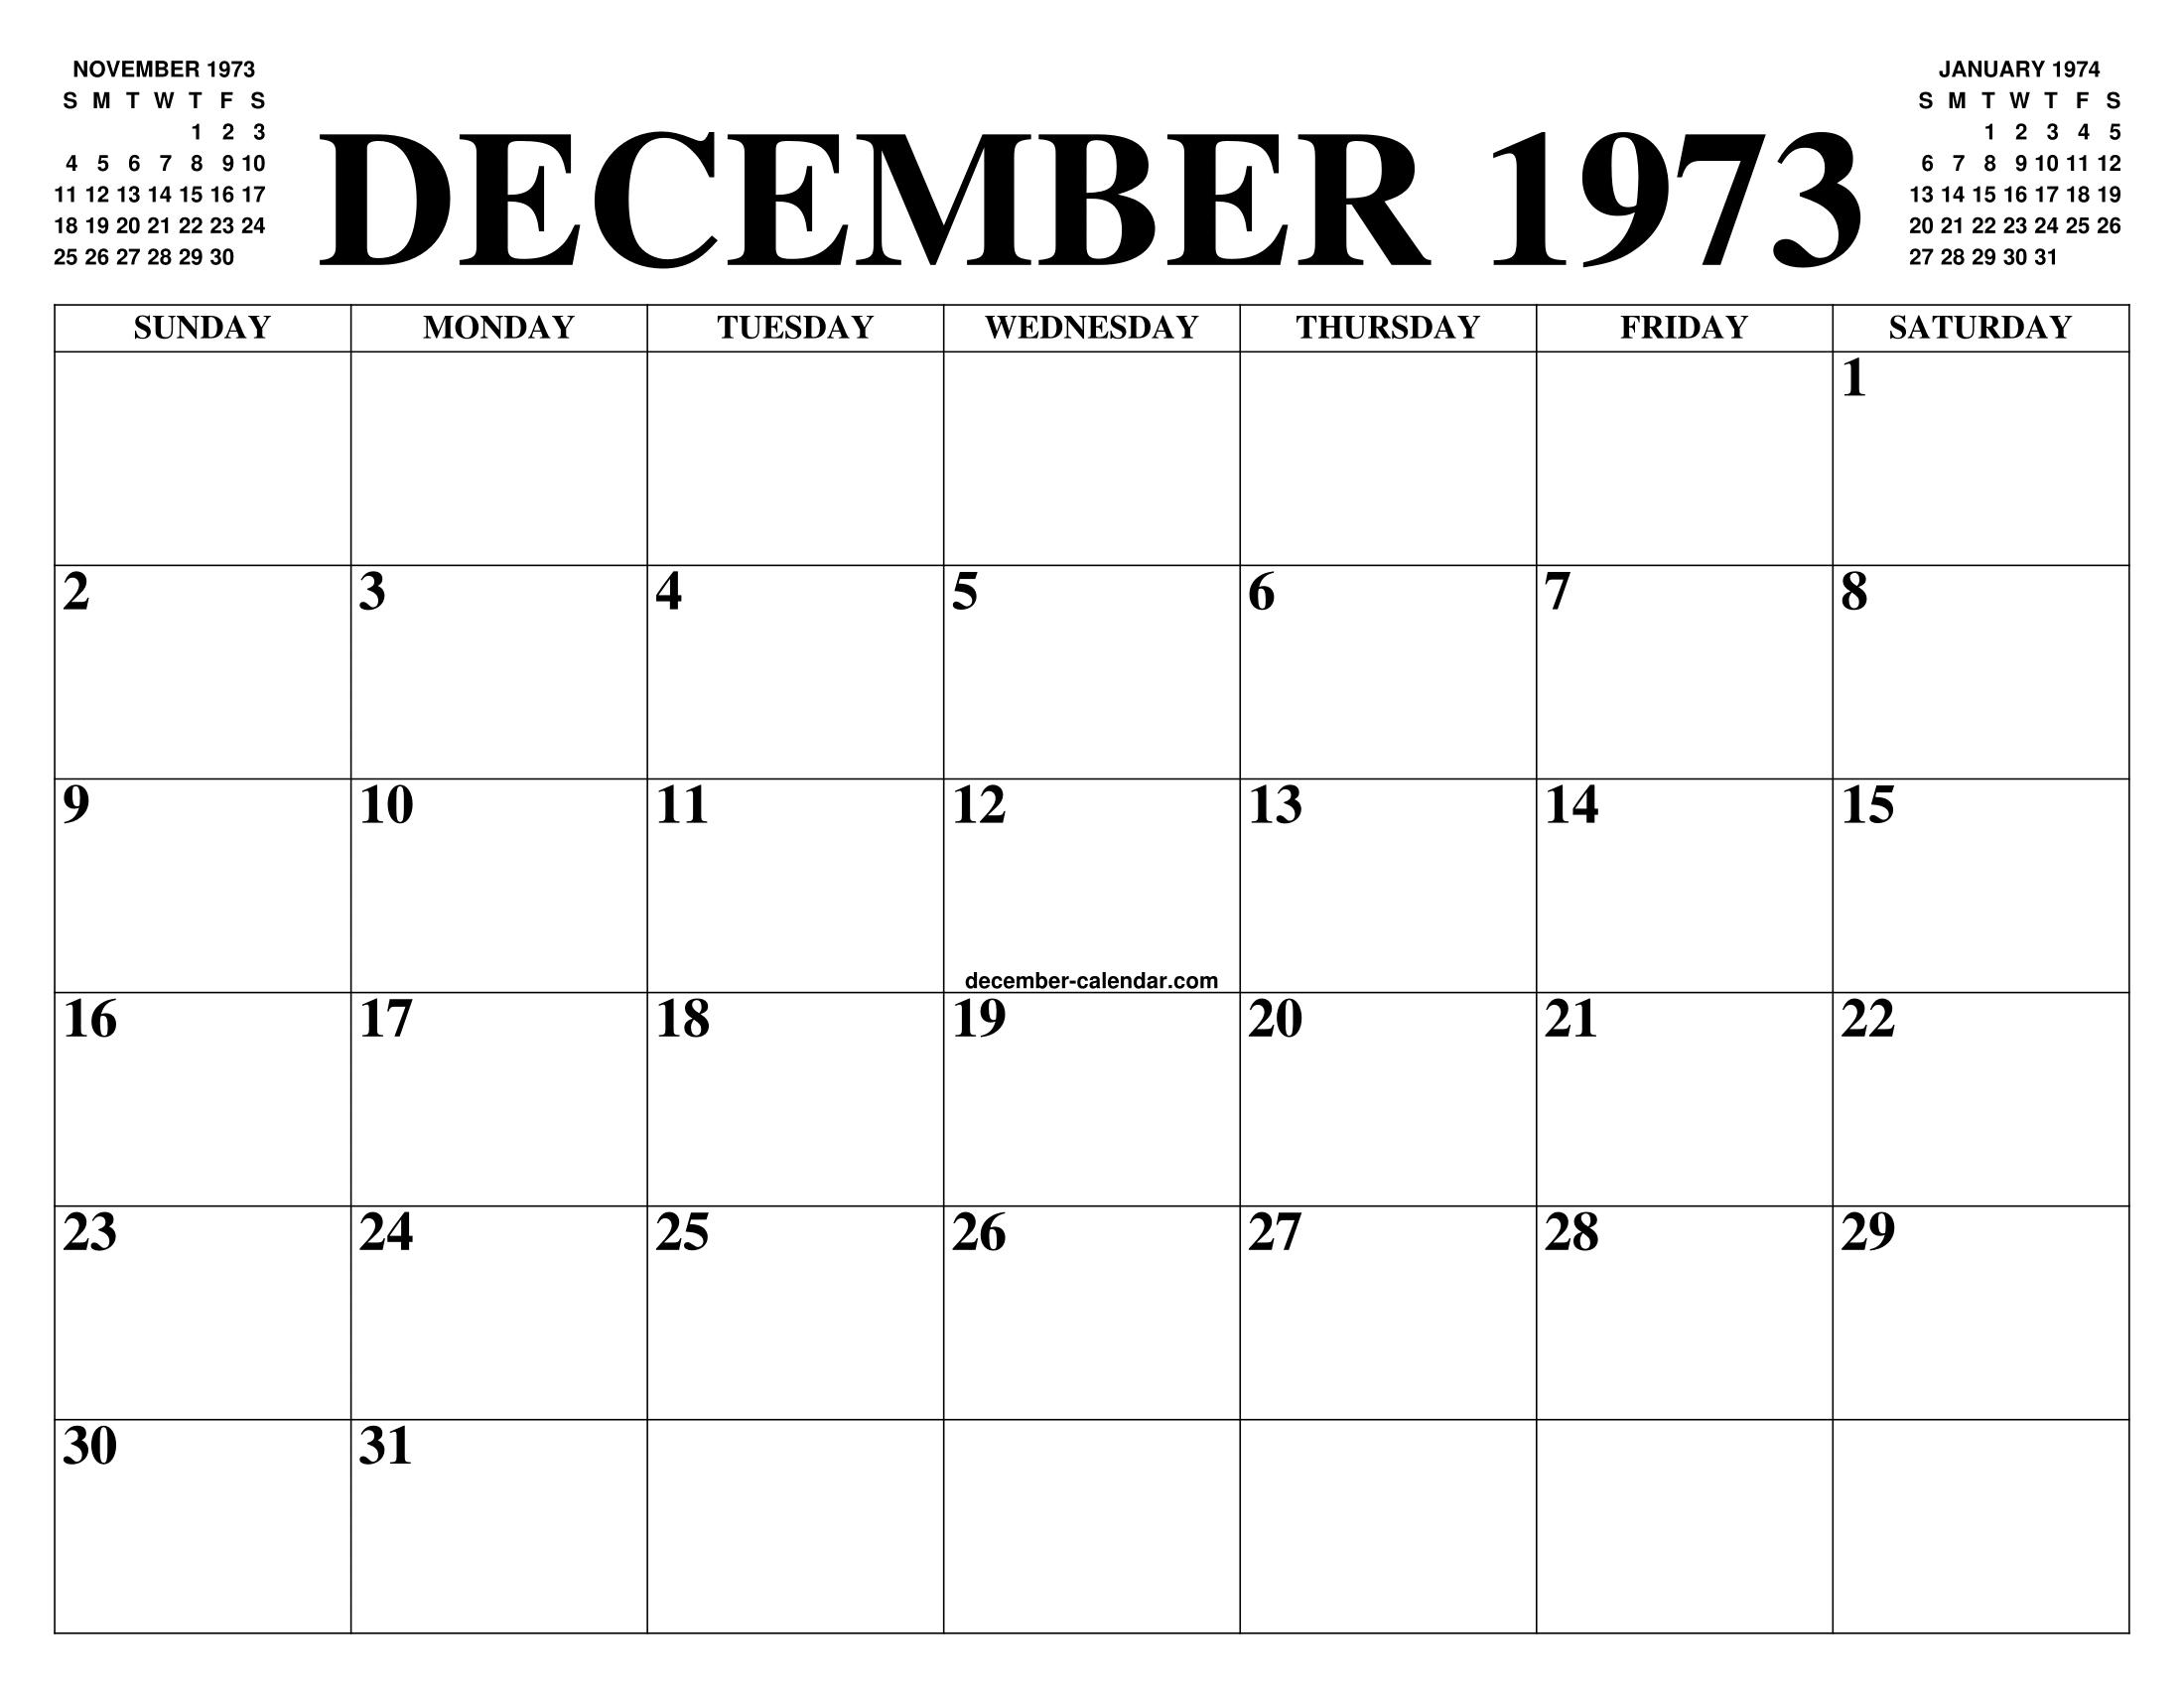 Calendario 1973.December 1973 Calendar Of The Month Free Printable December